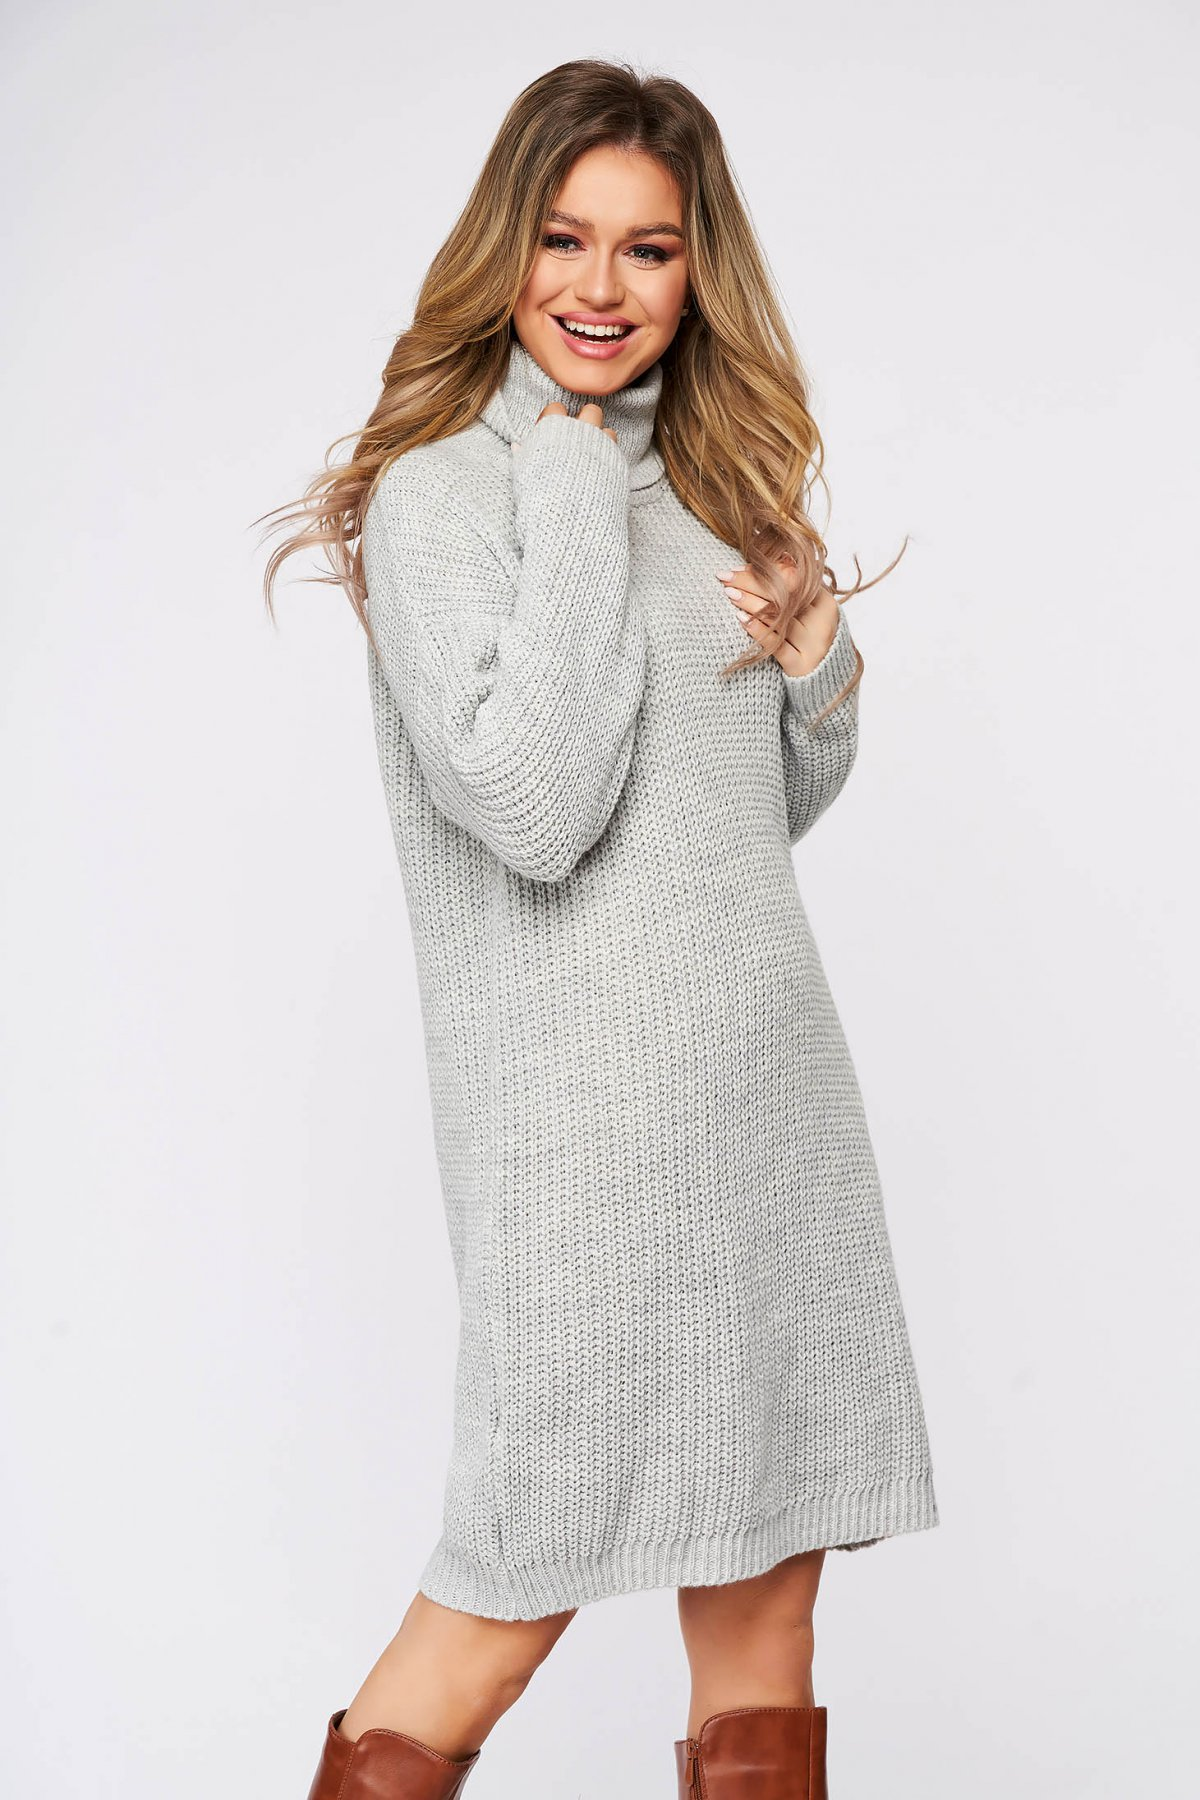 Rochie SunShine casual gri din material tricotat pe gat cu croi larg SunShine